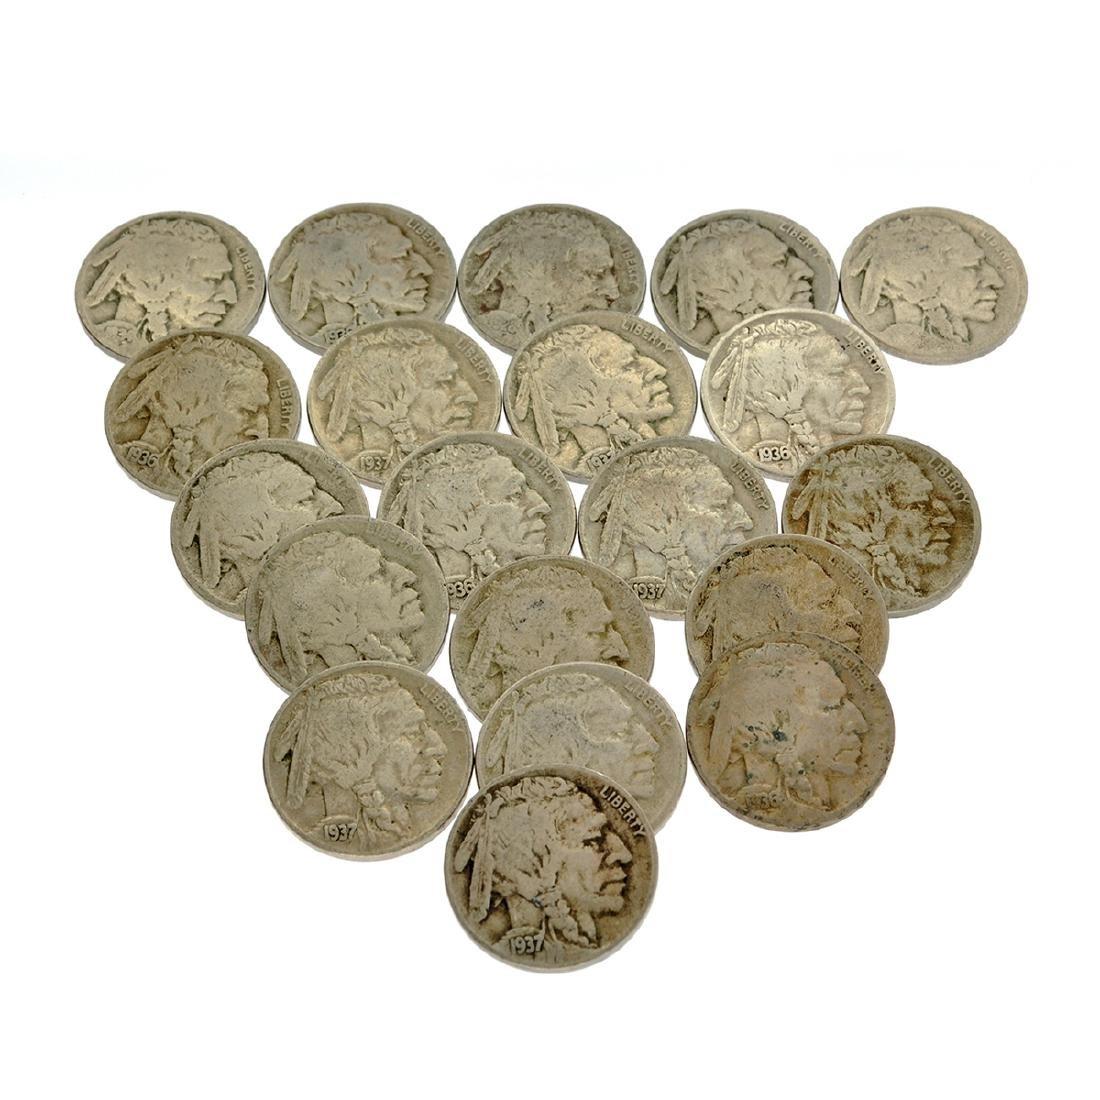 20 Misc. Buffalo Nickel Coins